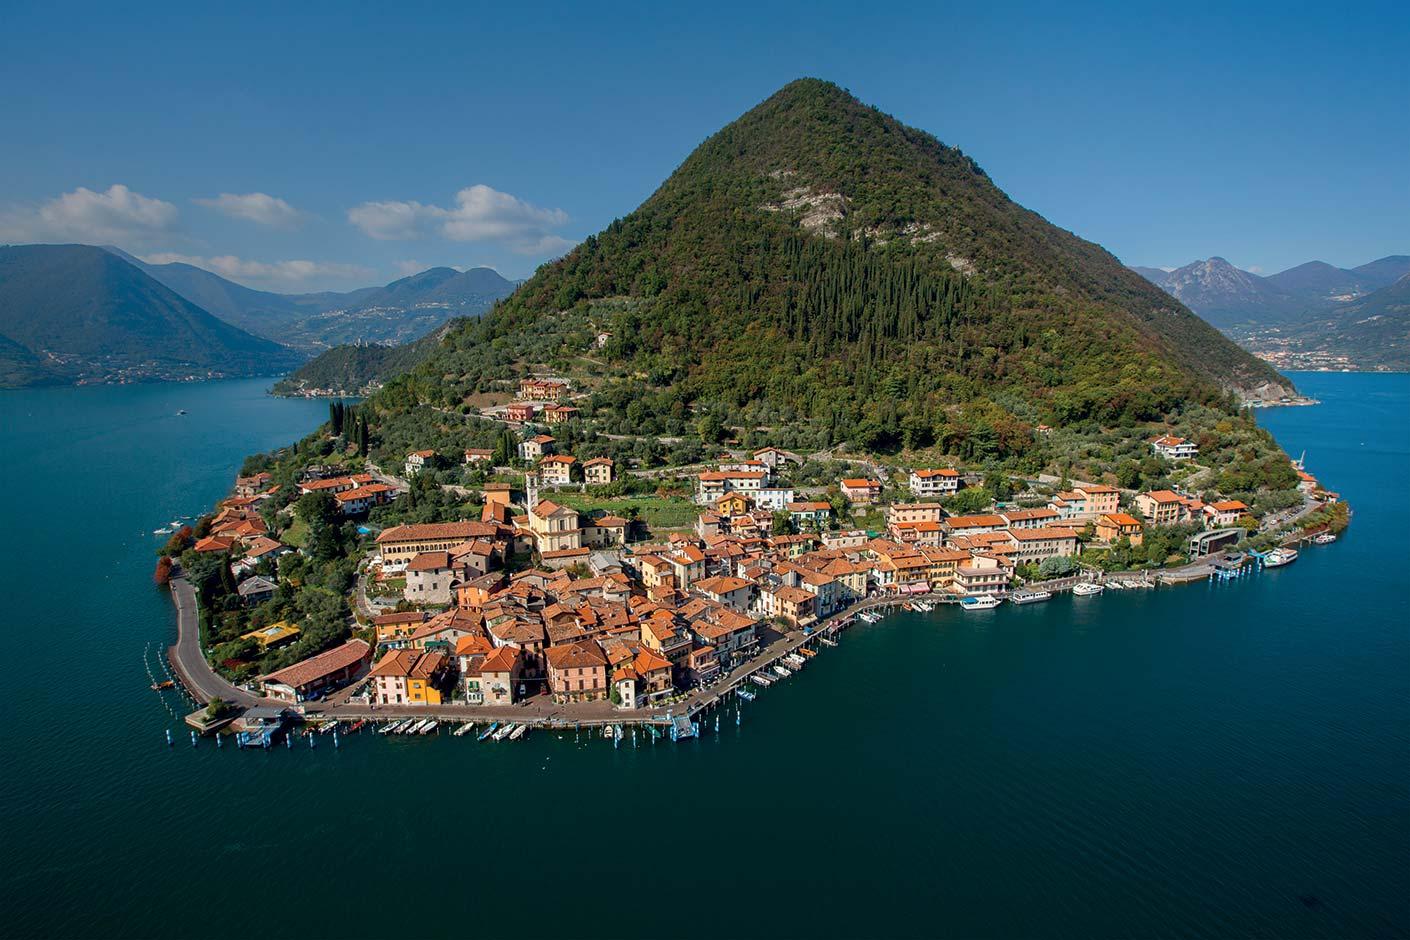 montisola-island-in-eu-secret-world